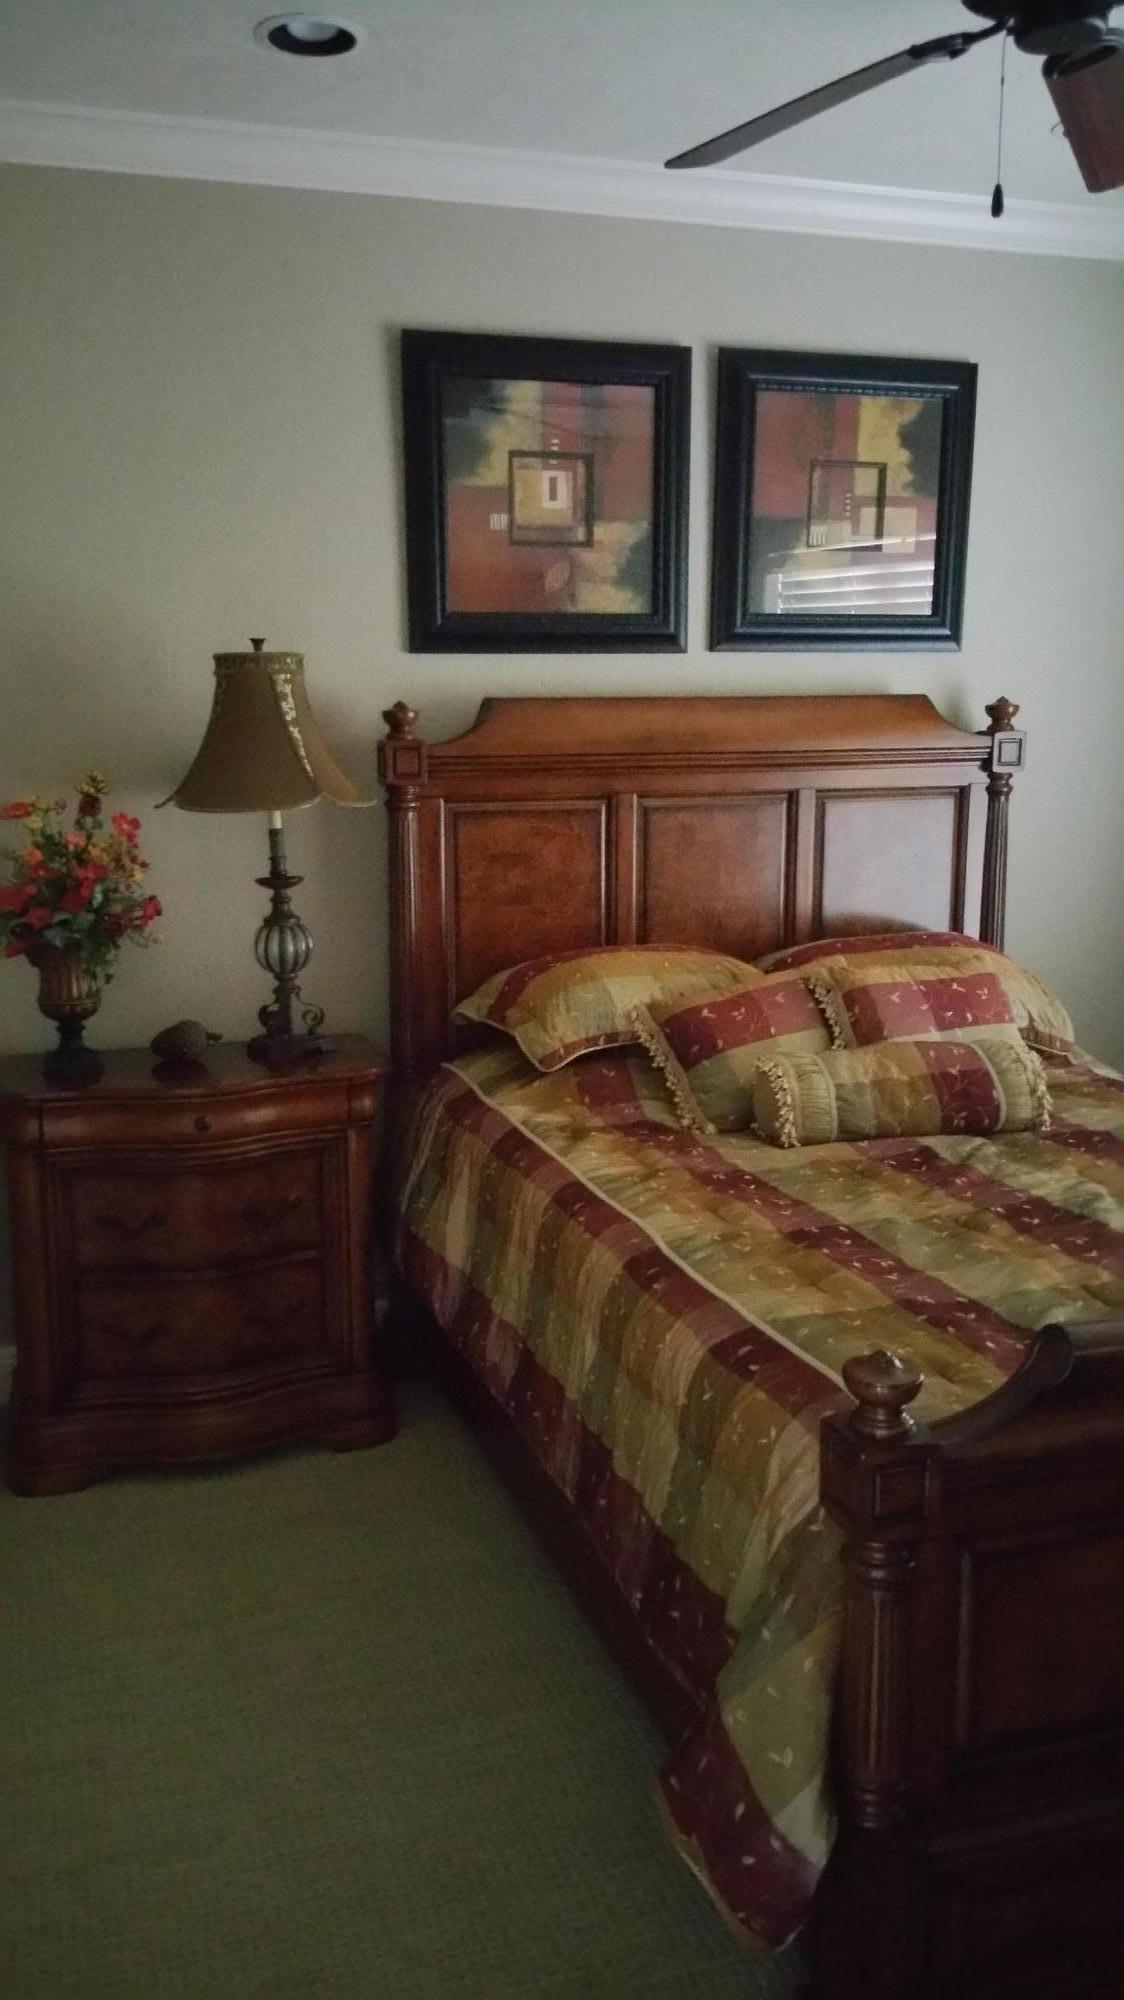 New memory foam mattress for sofa bed